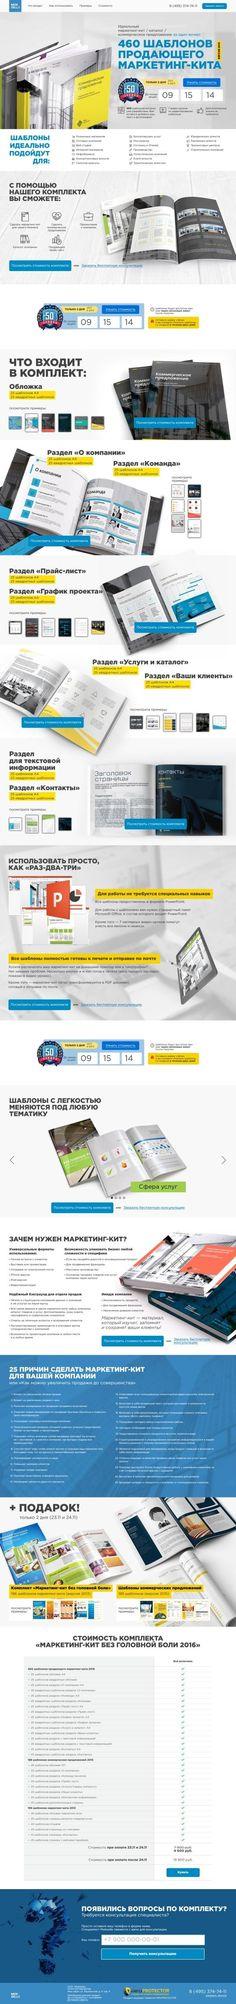 Screenshot http://www.kit5.ru/?utm_source=fb&utm_medium=cpc&utm_campaign=lal_baza_kit&utm_content=kitslon&rs=facebook3_6060483487885_6060483424285_6060483425285 - created via https://pinthemall.net